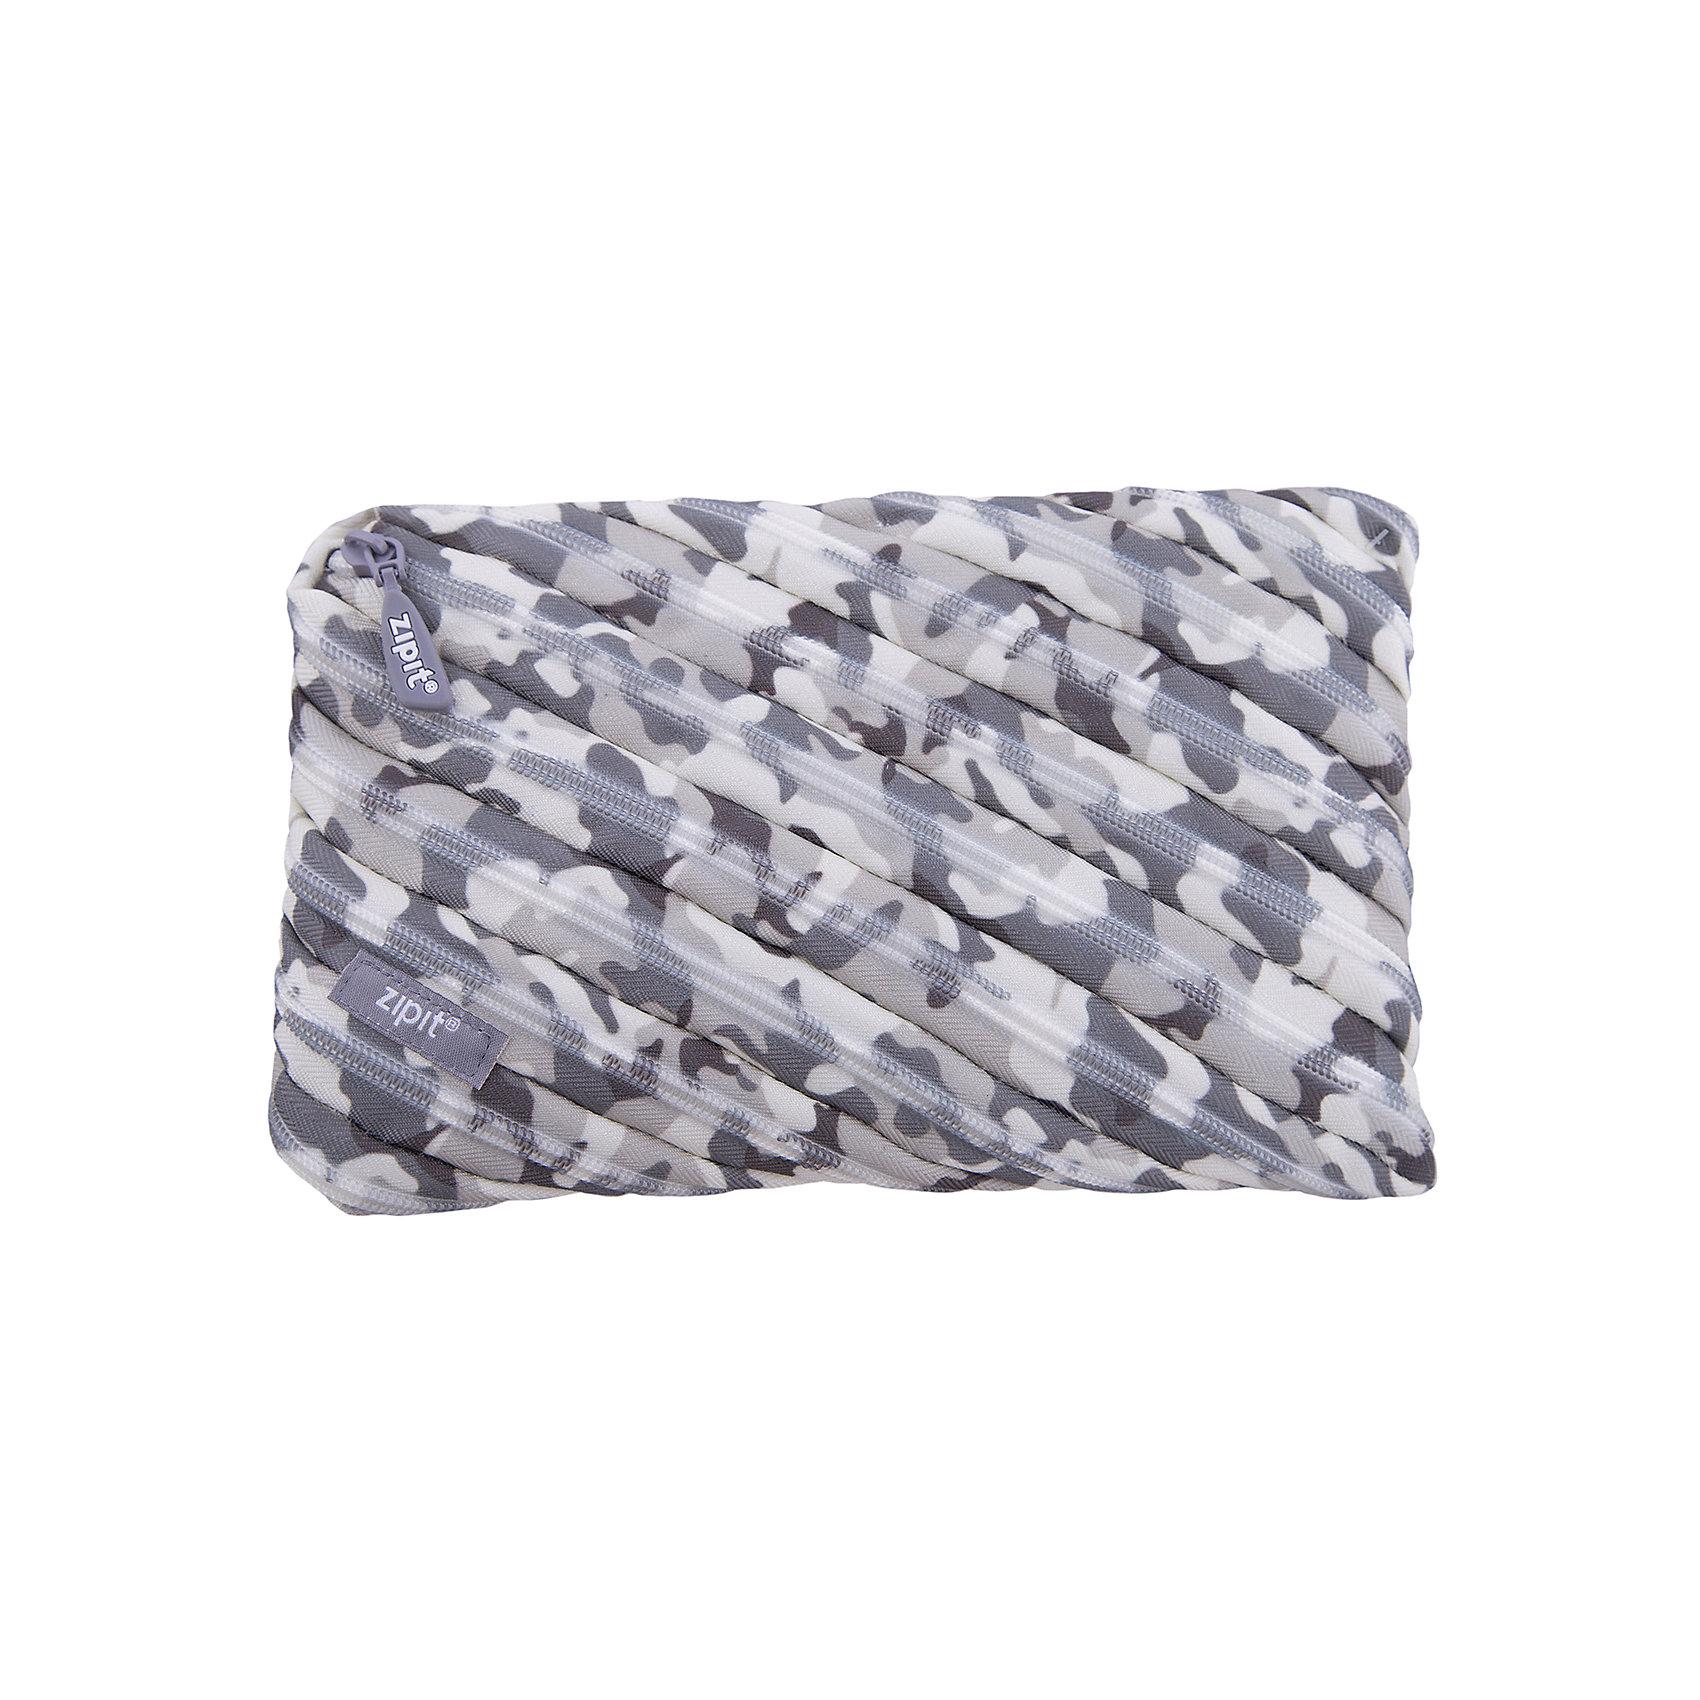 Пенал-сумочка CAMO JUMBO POUCH, цвет серый камуфляжПеналы без наполнения<br>Вес: 0,1 кг<br>Размер: 23х2х15 см<br>Состав: пенал-сумочка<br>Наличие светоотражающих элементов: нет<br>Материал: полиэстер<br><br>Ширина мм: 230<br>Глубина мм: 20<br>Высота мм: 150<br>Вес г: 100<br>Возраст от месяцев: 36<br>Возраст до месяцев: 720<br>Пол: Унисекс<br>Возраст: Детский<br>SKU: 7054166